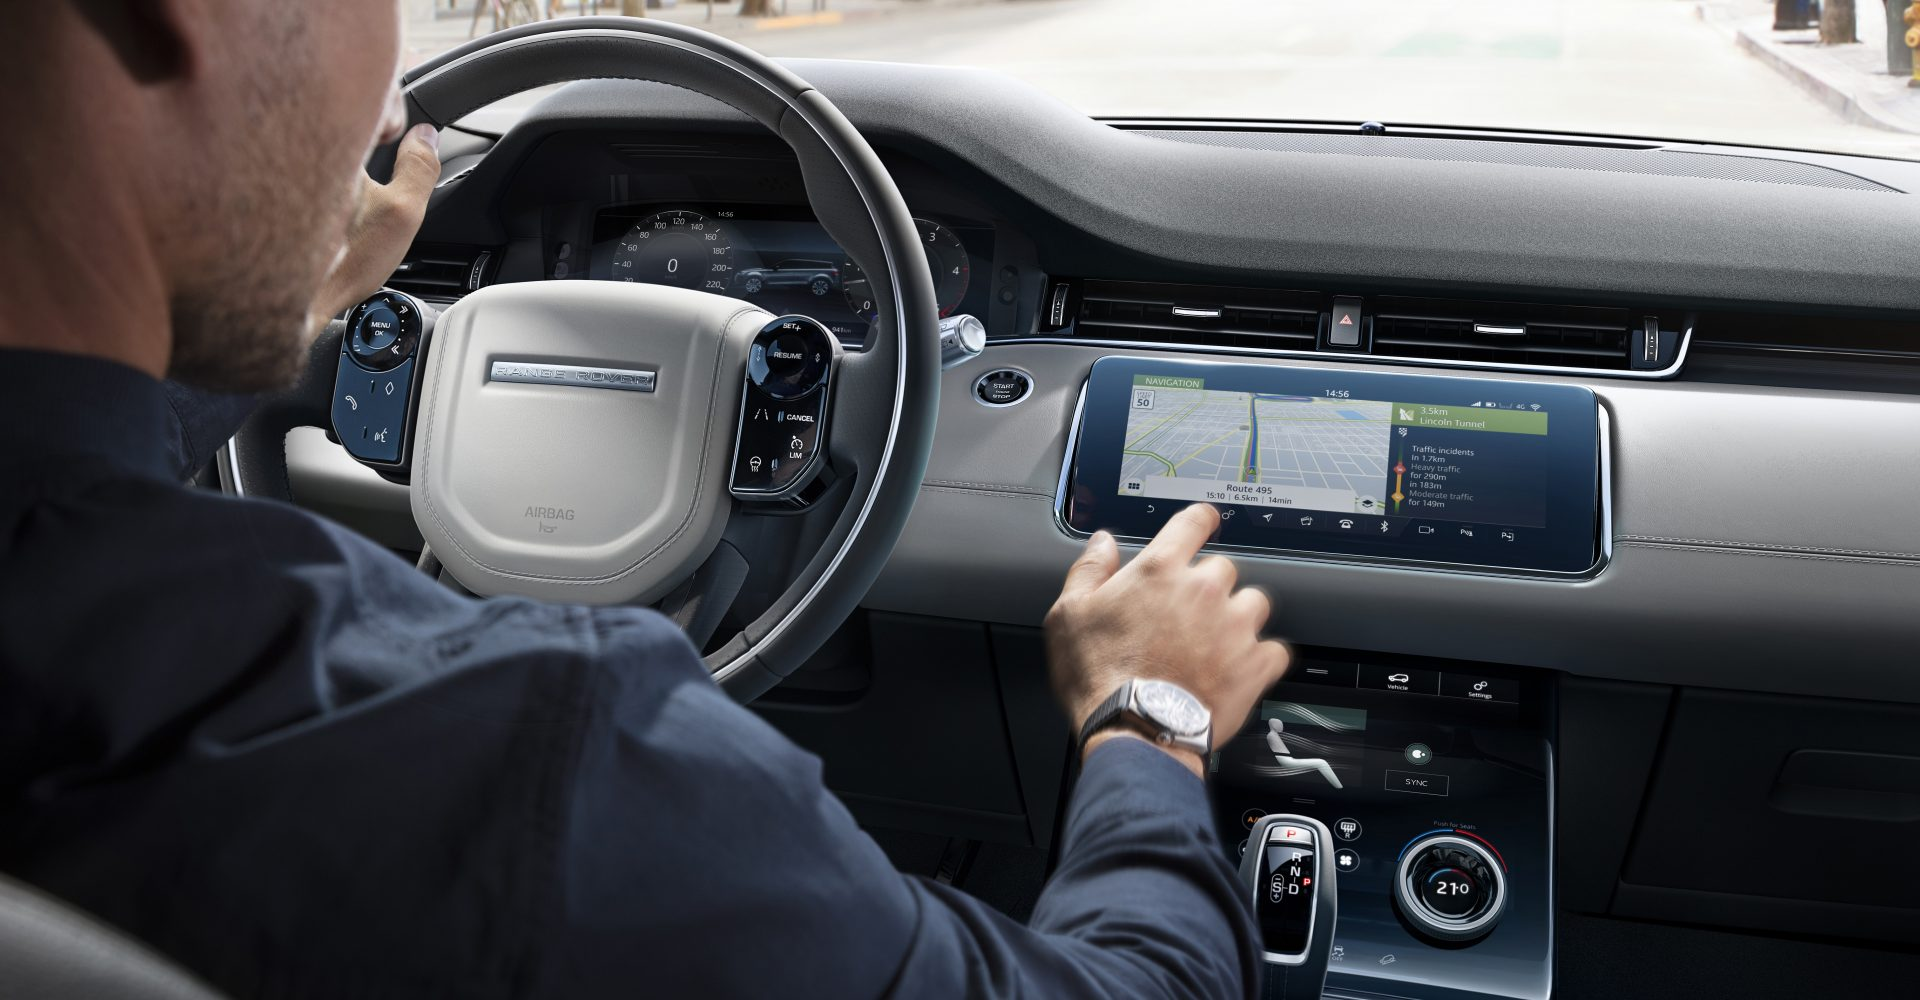 Jaguar Land Rover makes over-the-air updates standard on all models